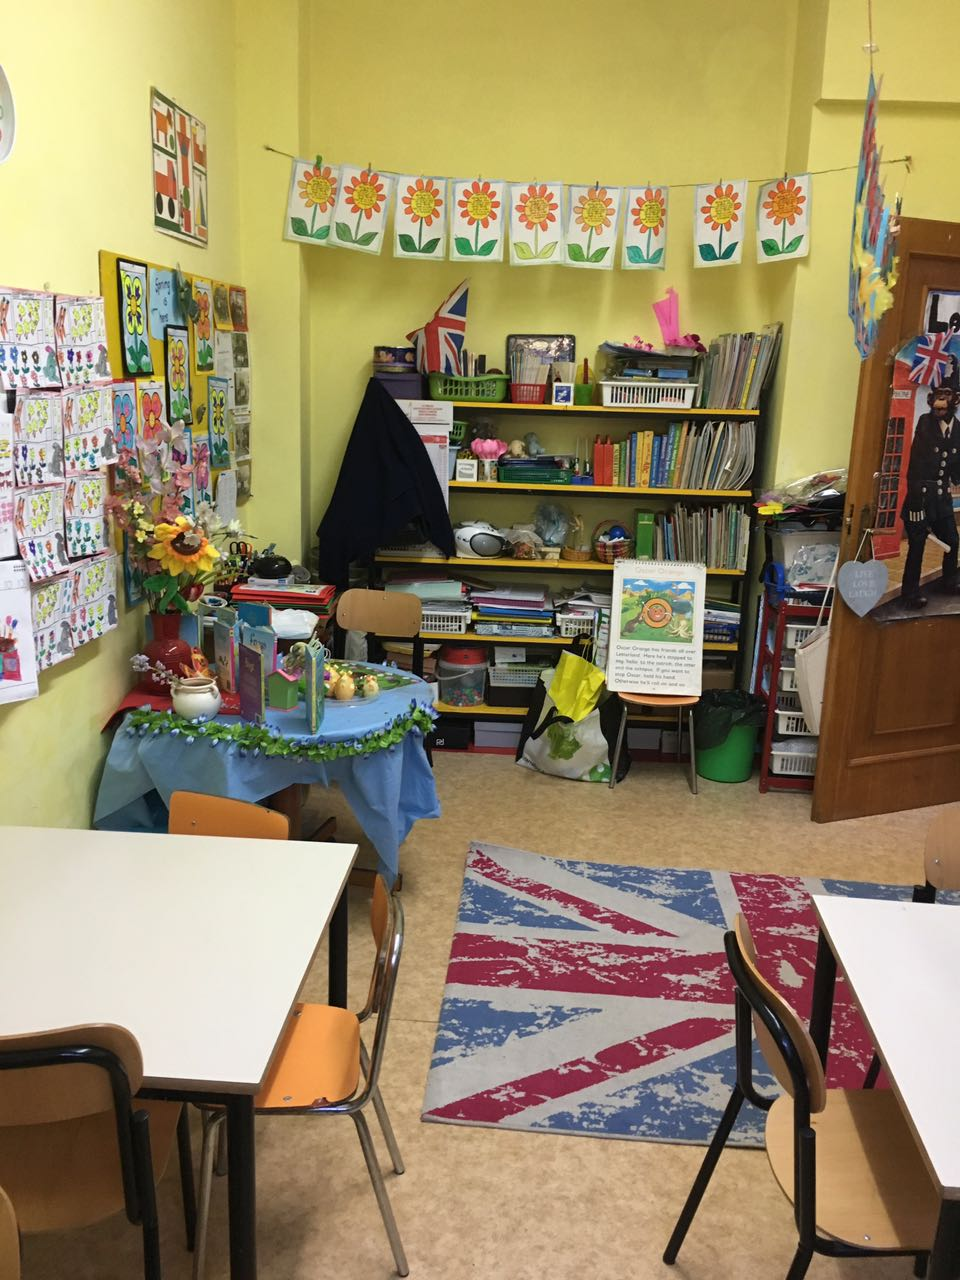 English-language nursery school in Marino, Rome